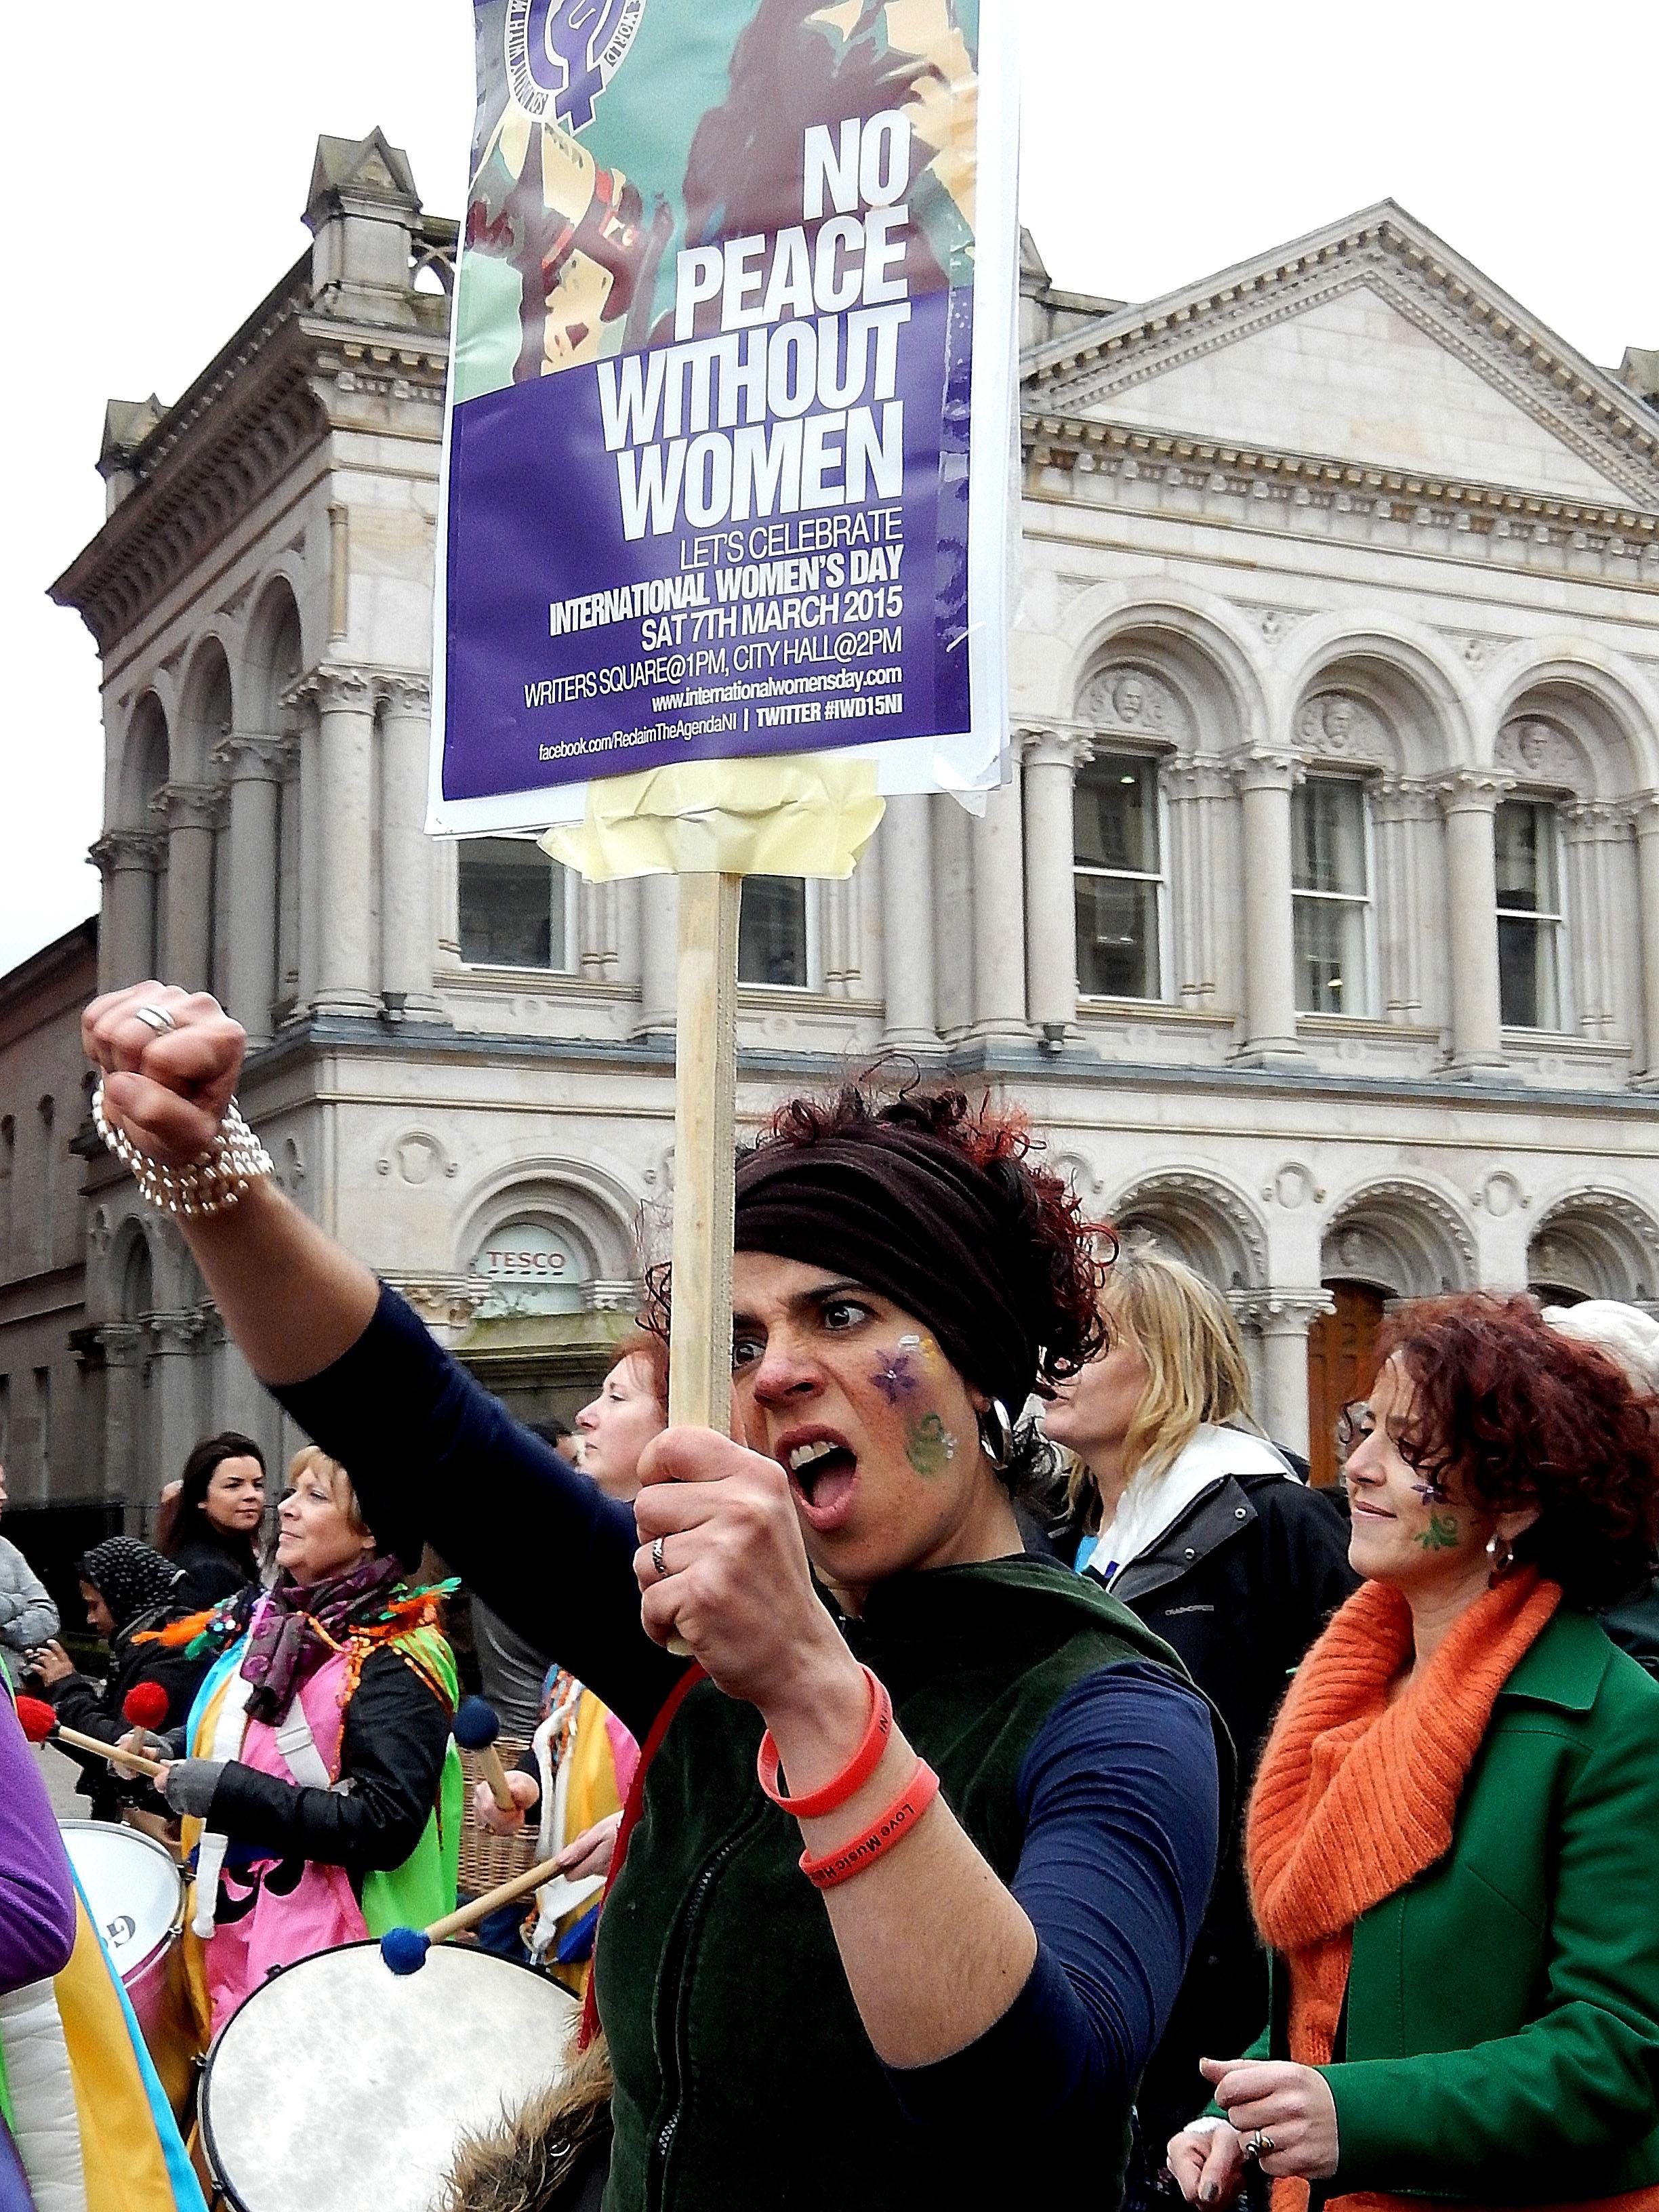 Belfast celebrates International Women's Day